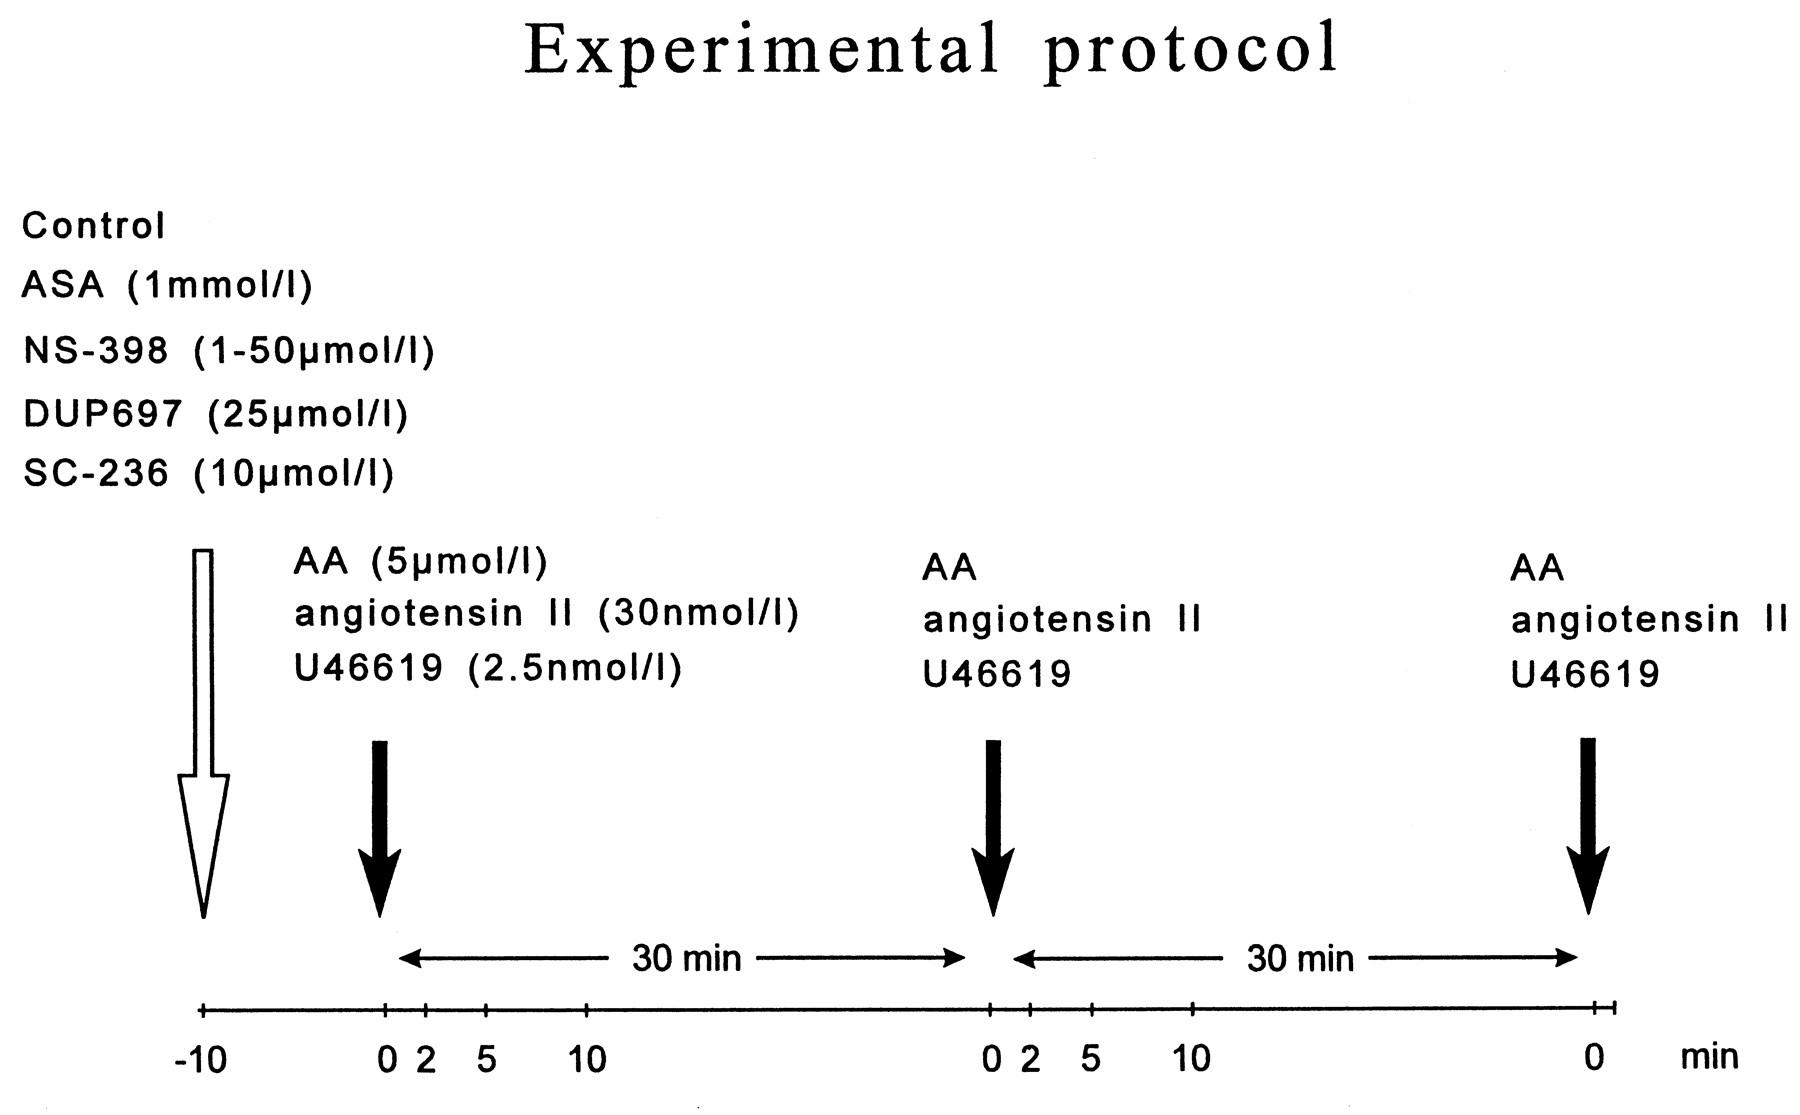 experiment 1 protocol